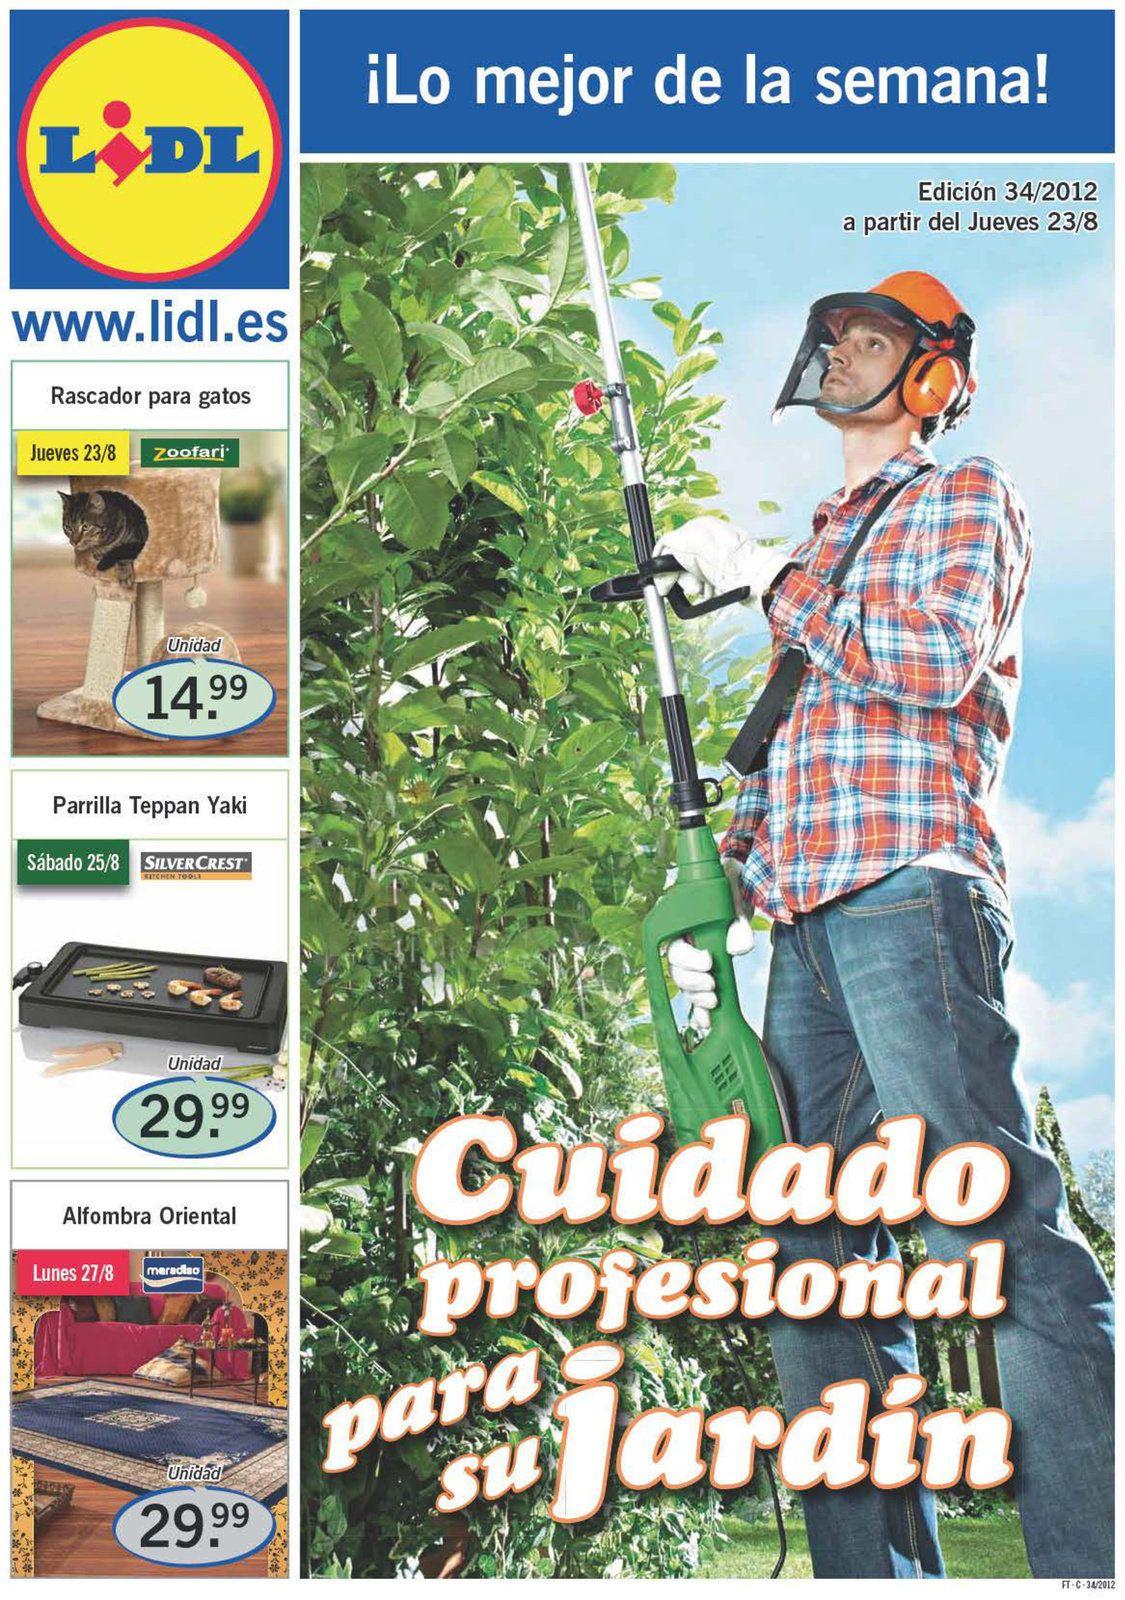 Lidl te da las mejores propuestas para ser un experto en tu jardín /  sc 1 st  Pinterest & Lidl te da las mejores propuestas para ser un experto en tu jardín ...